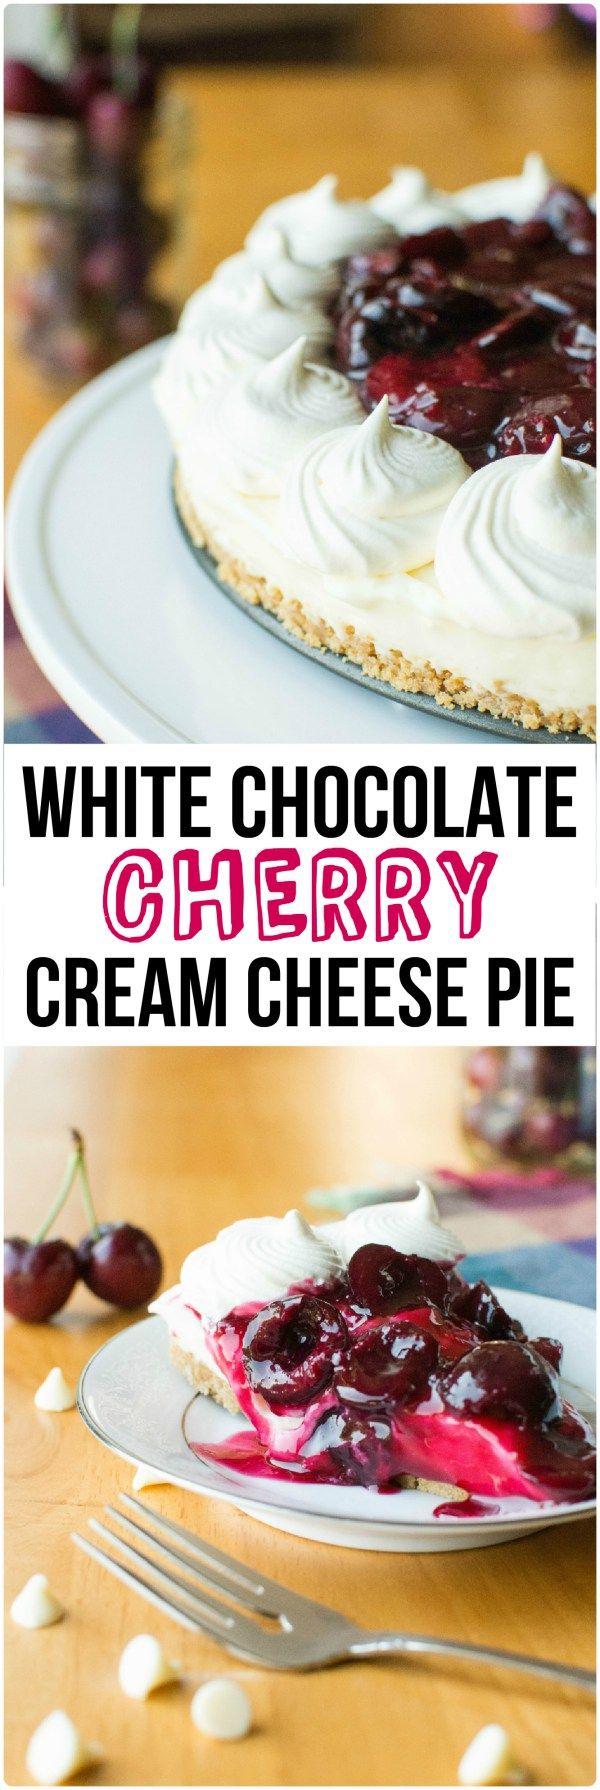 White Chocolate Cherry Cream Cheese Pie | A baJillian Recipes